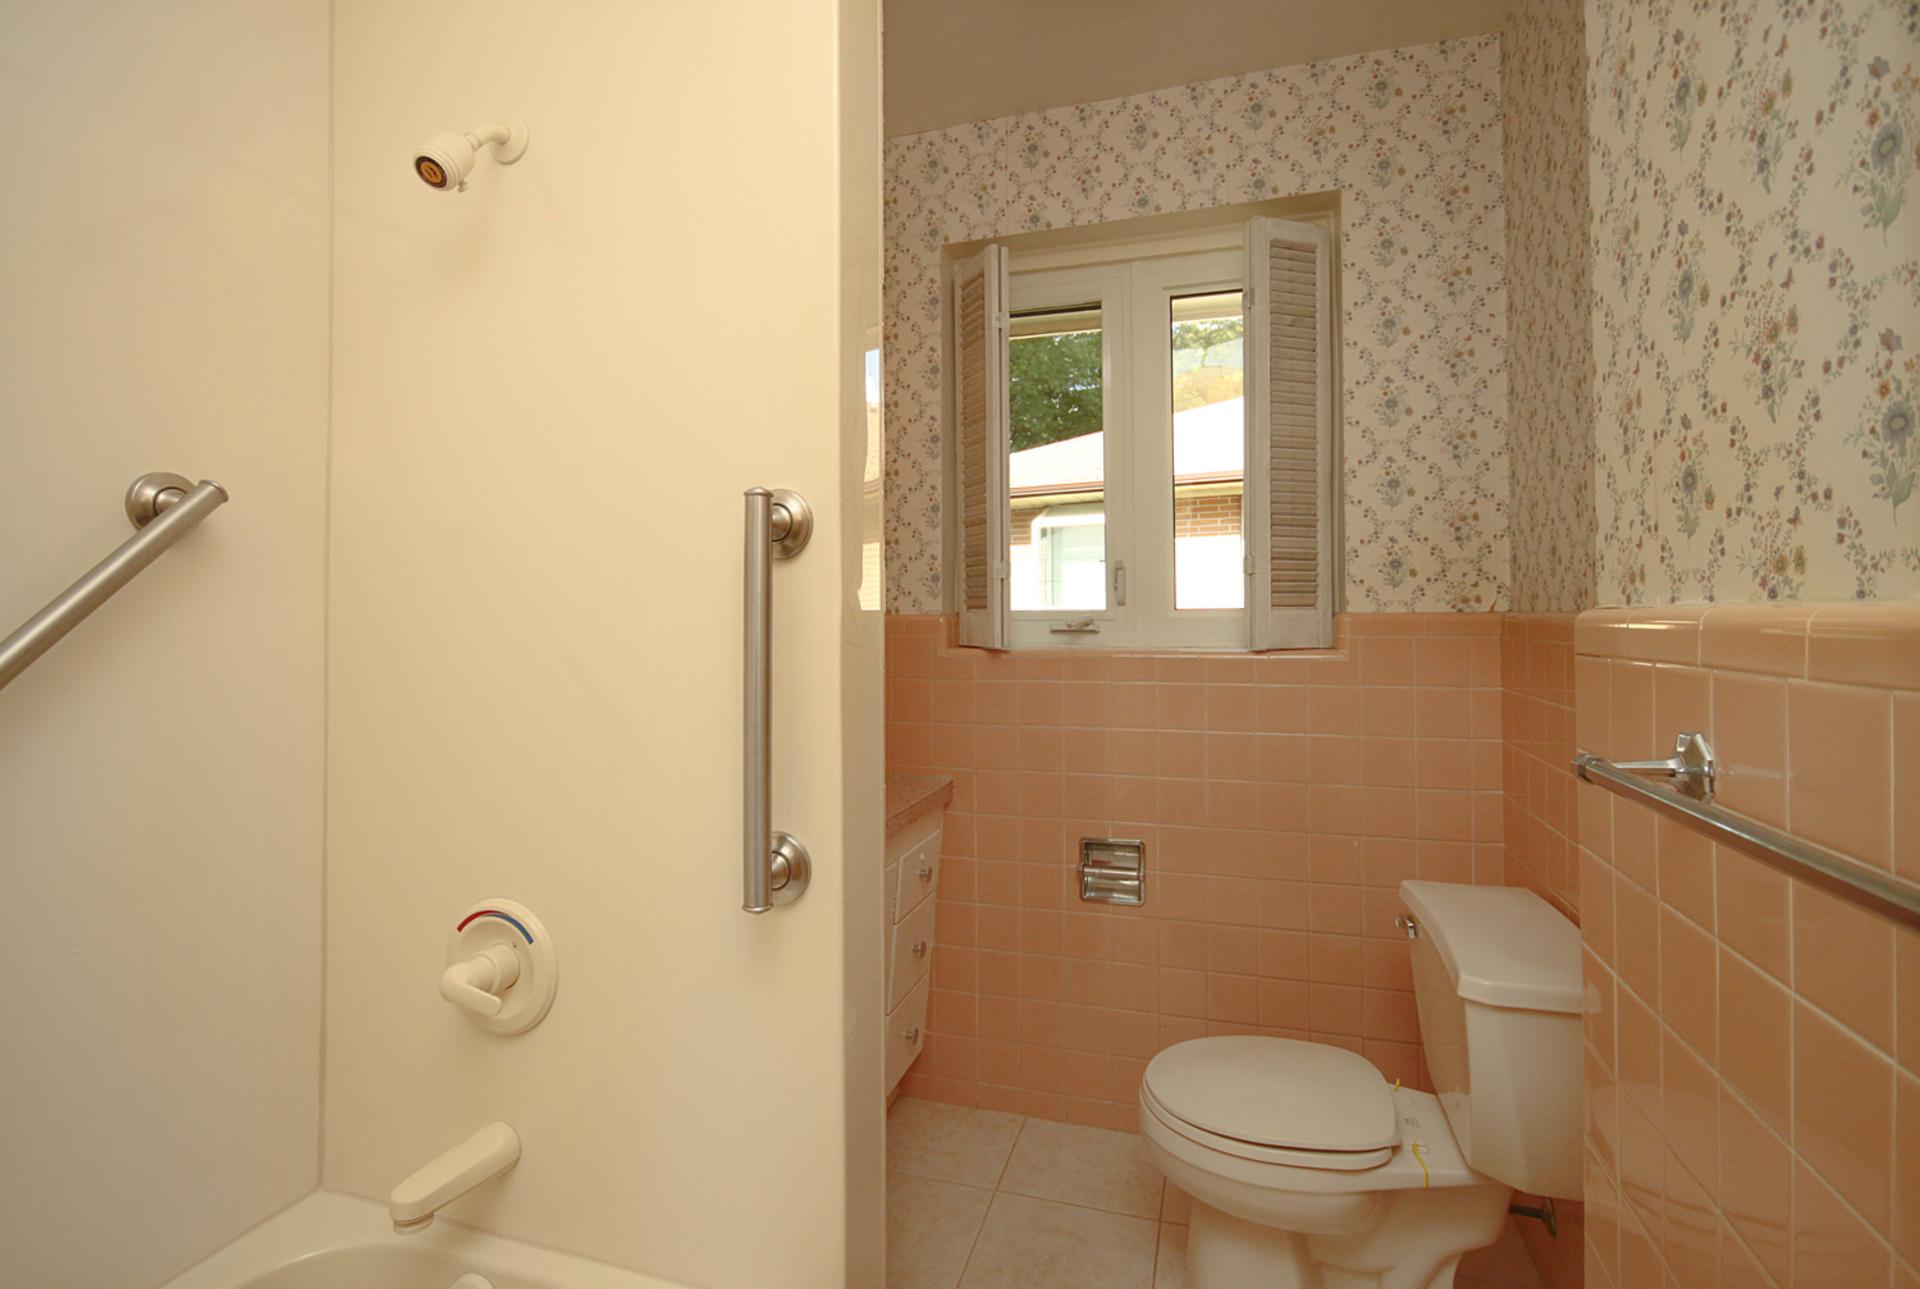 4 Piece Bathroom at 29 Groveland Crescent, Parkwoods-Donalda, Toronto